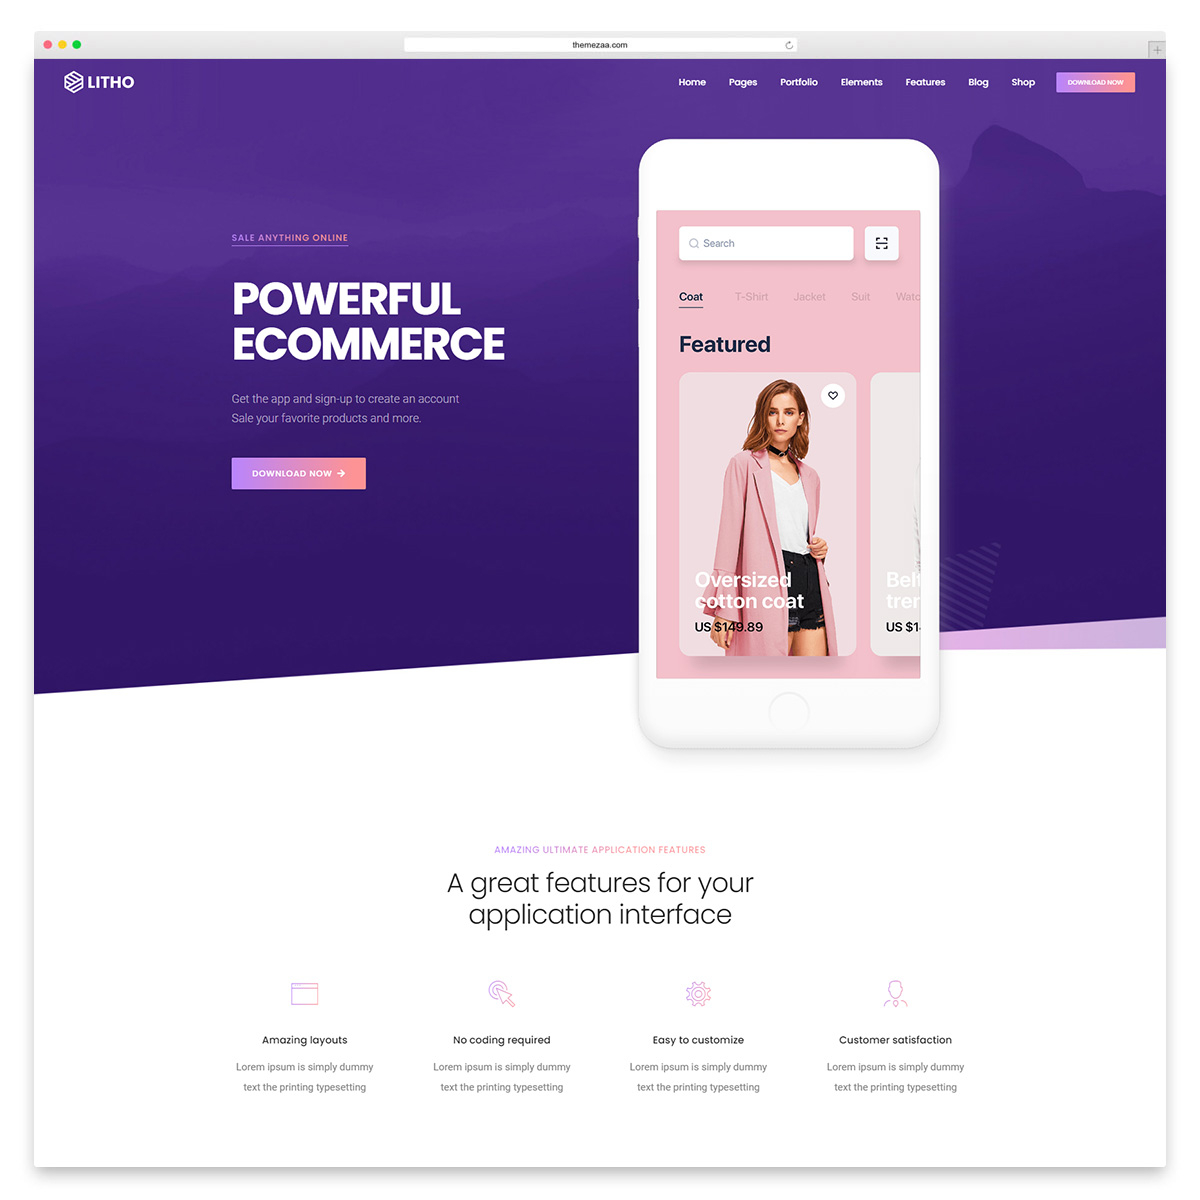 litho app showcase wordpress theme